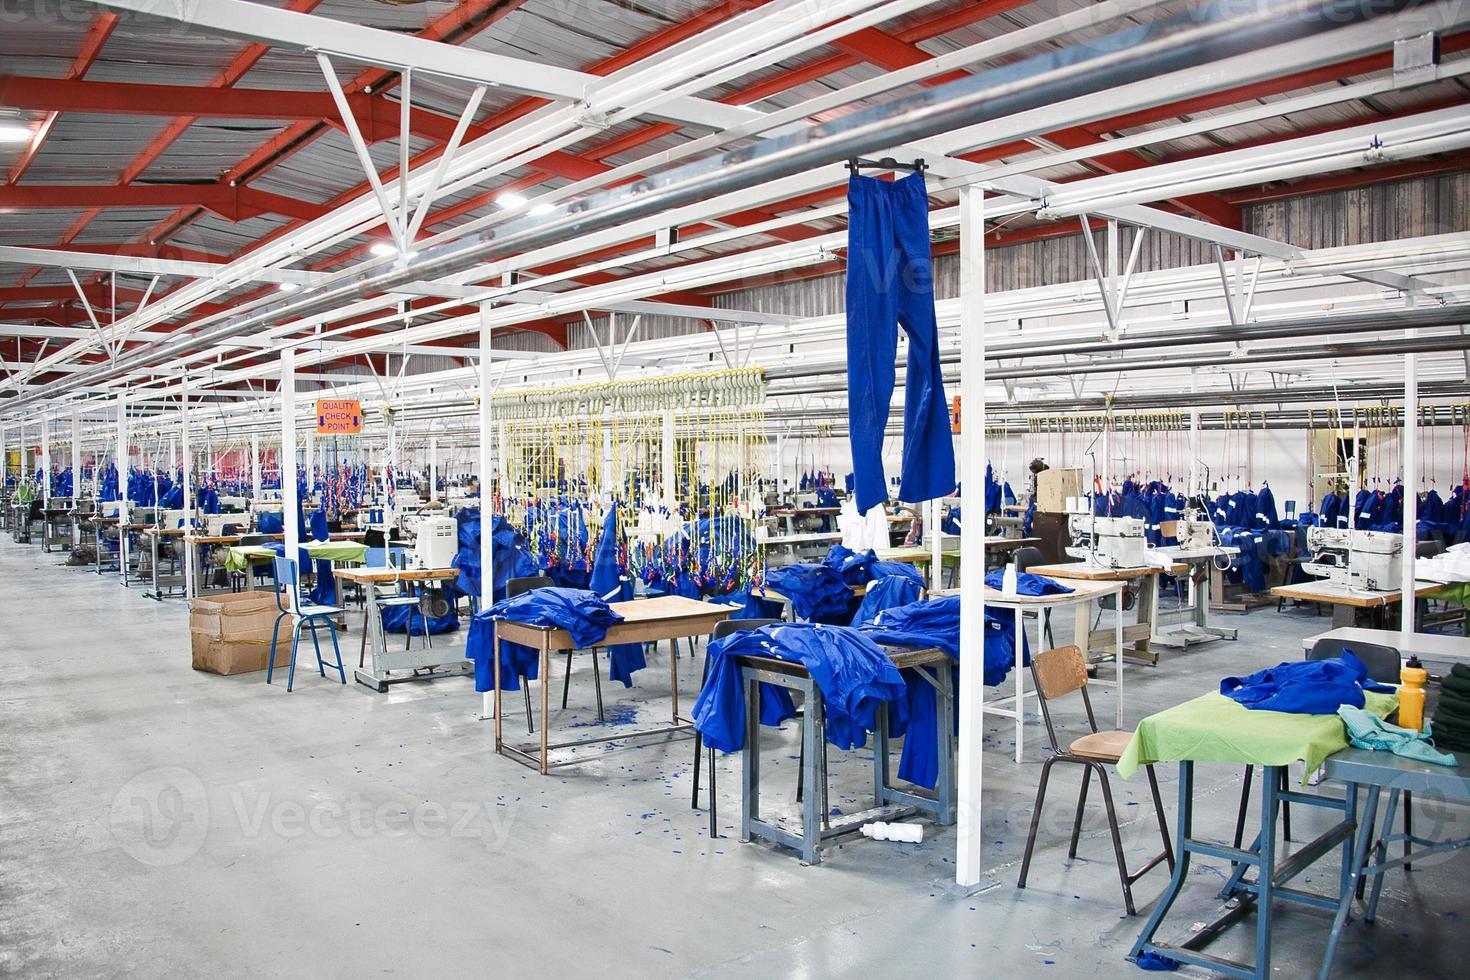 fabbrica tessile industriale foto